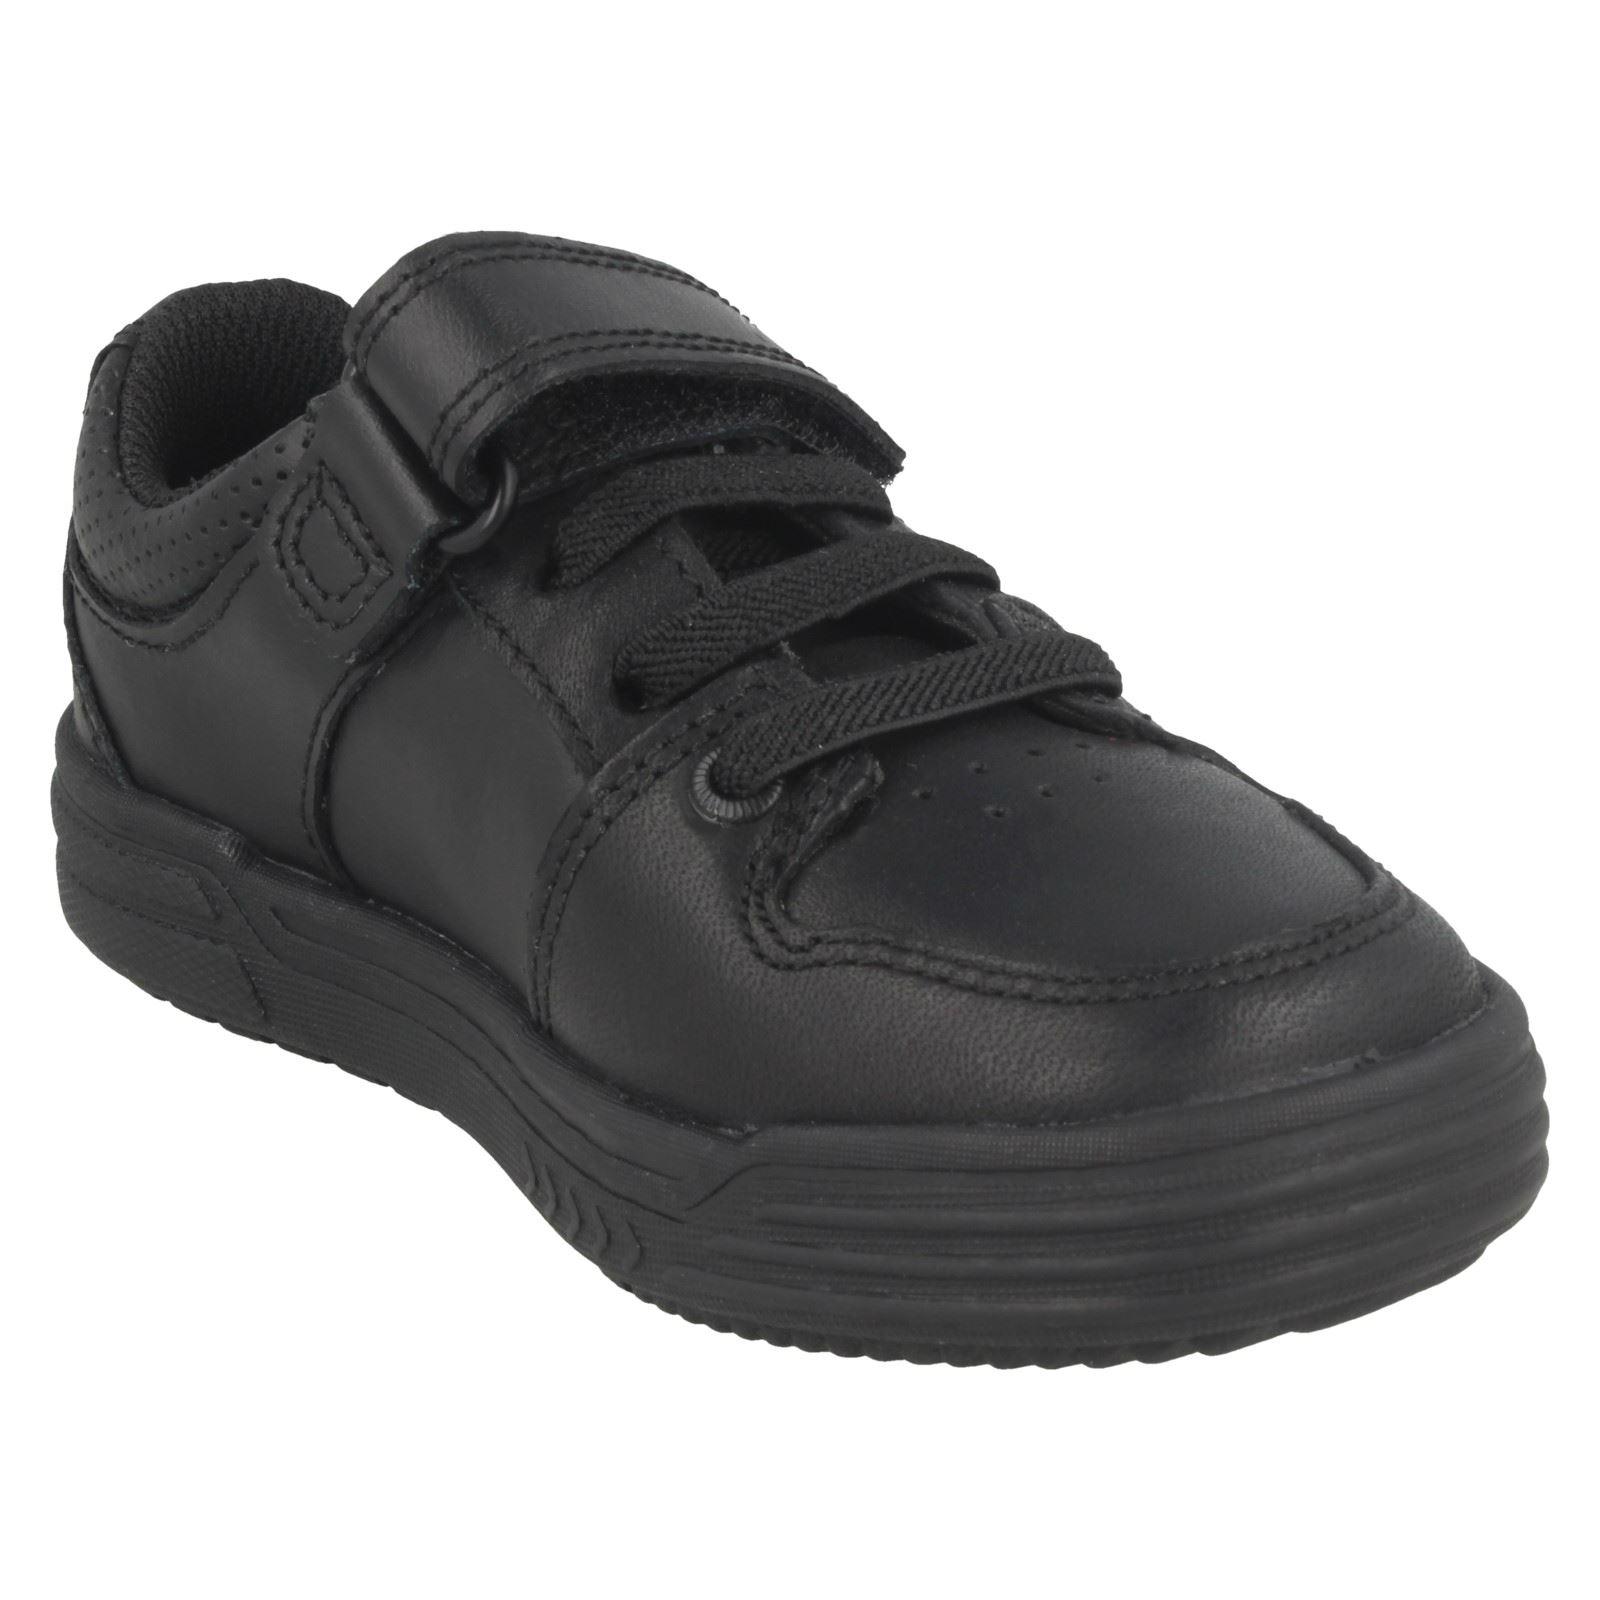 Boys-Clarks-Smart-School-Shoes-Chad-Slide